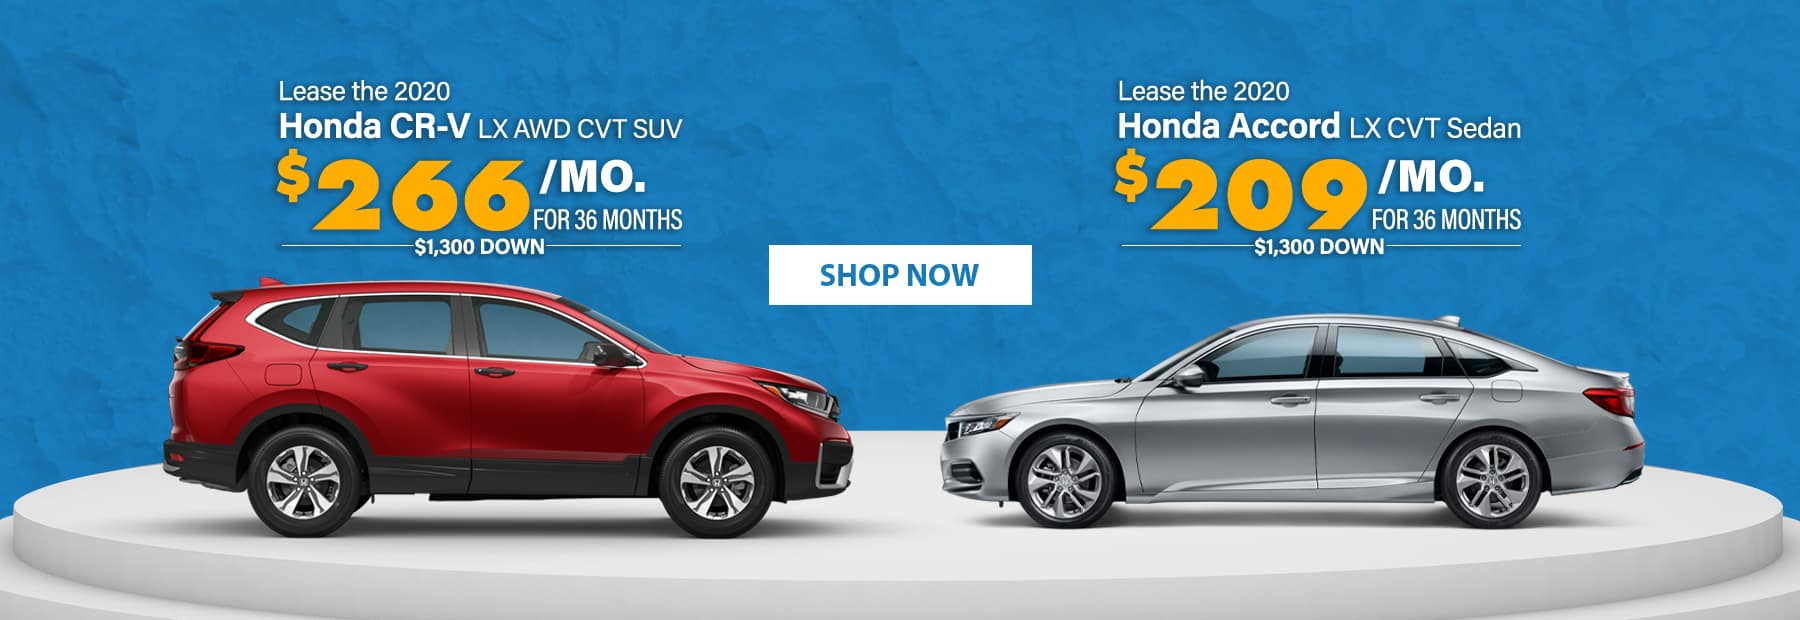 Lease a 2020 Honda CR-V LX AWD CVT SUV or Lease a 2020 Honda Accord LX CVT Sedan